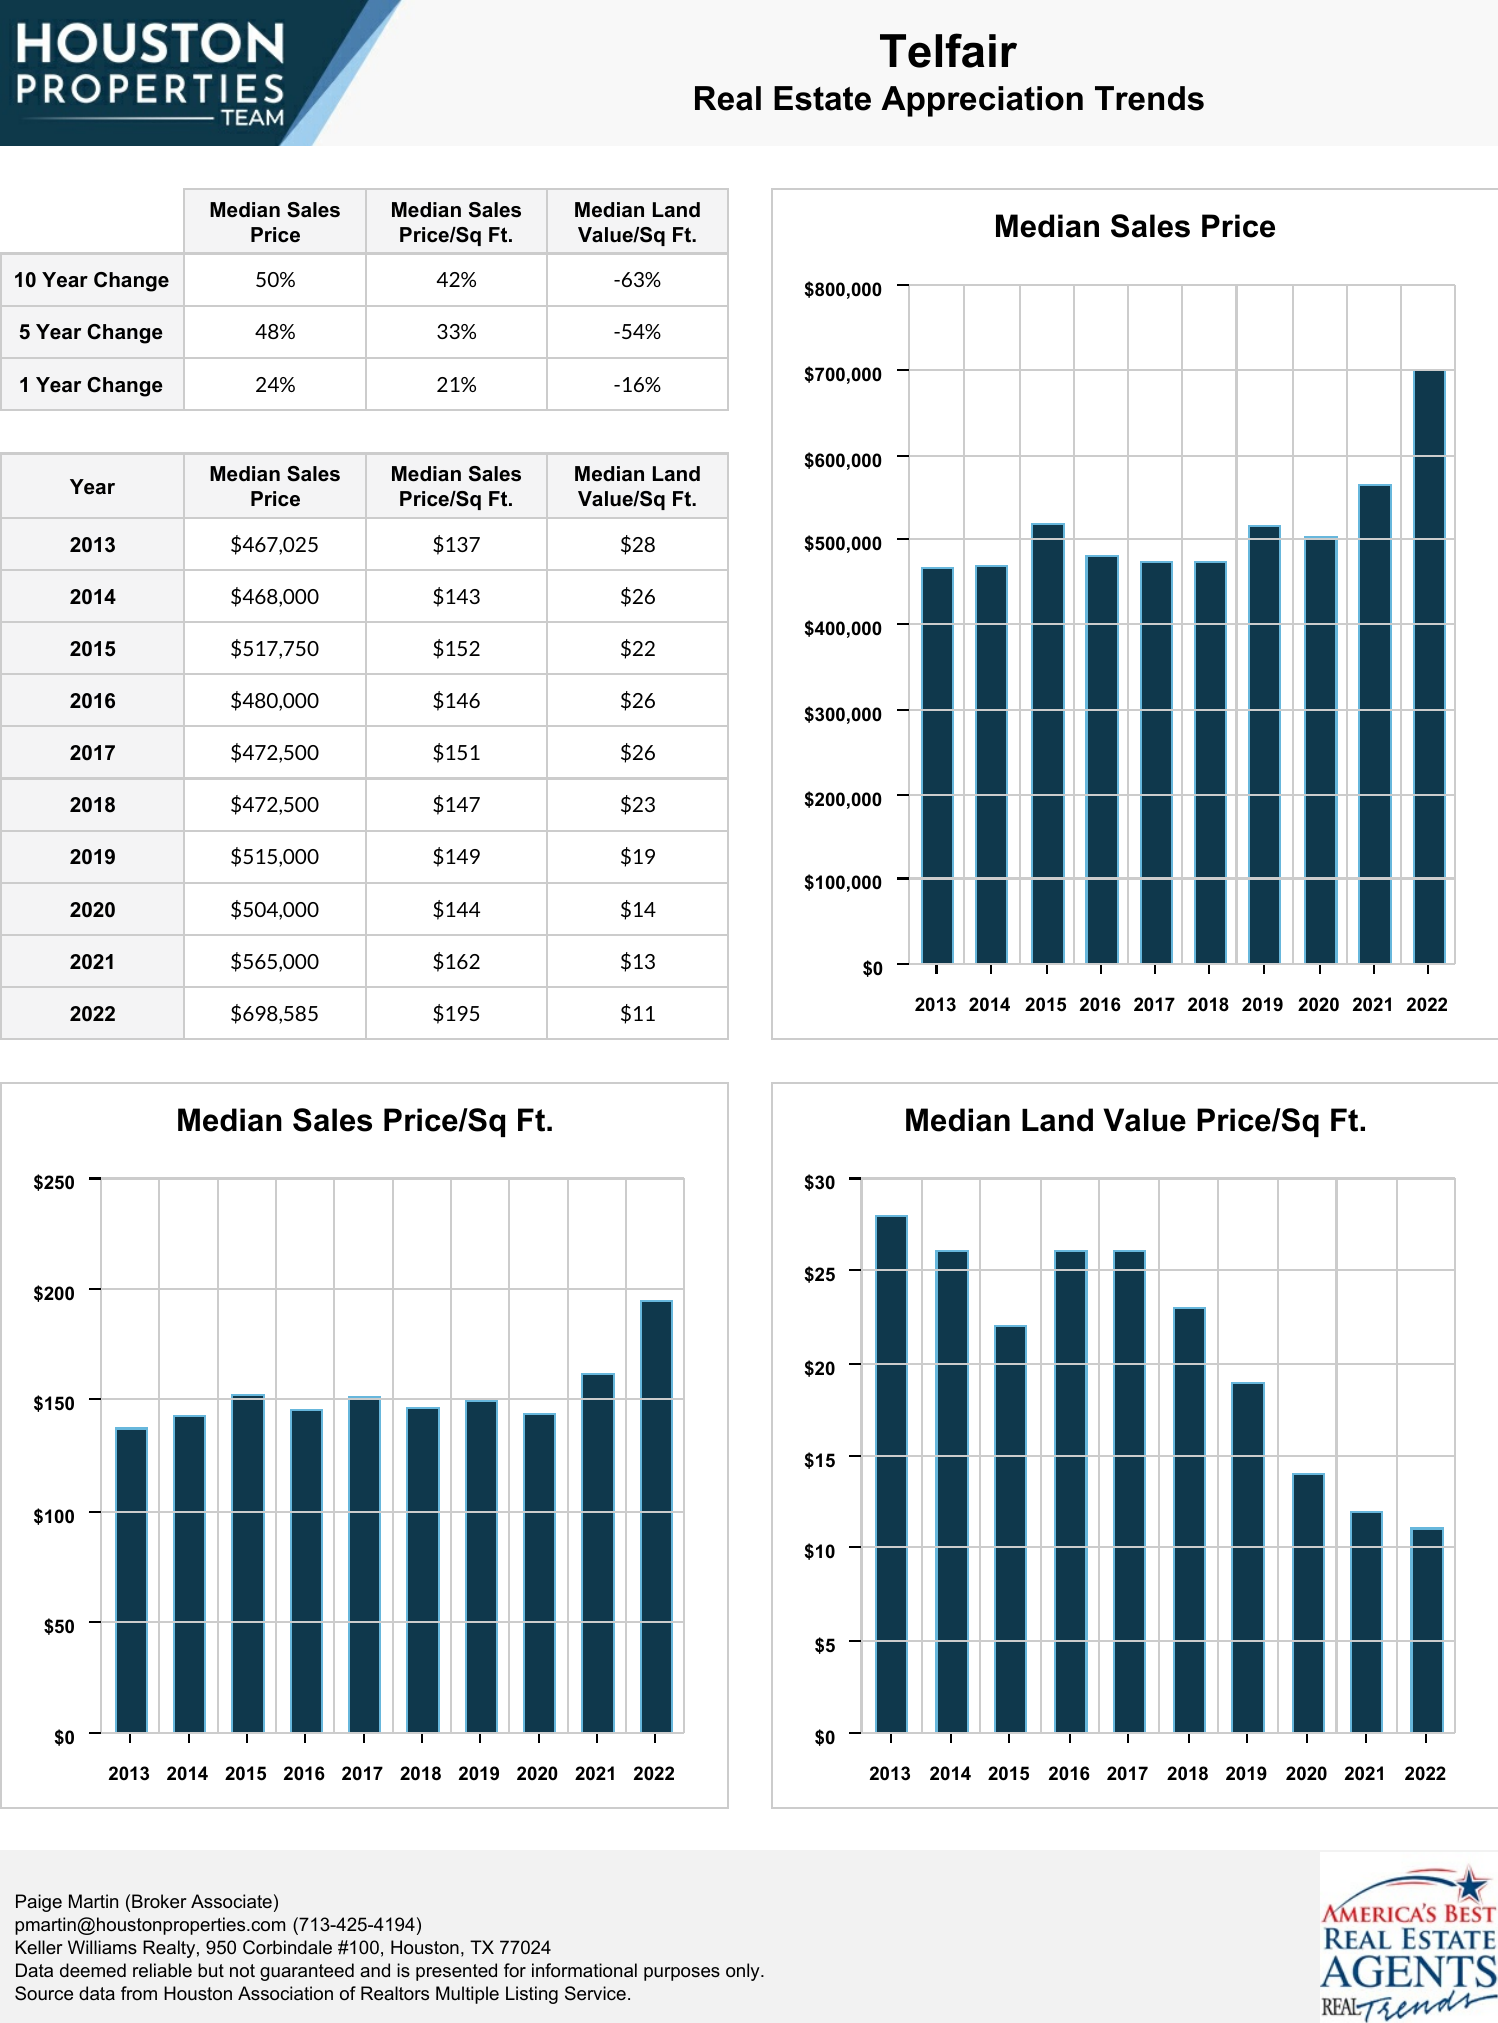 Telfair Real Estate Trends